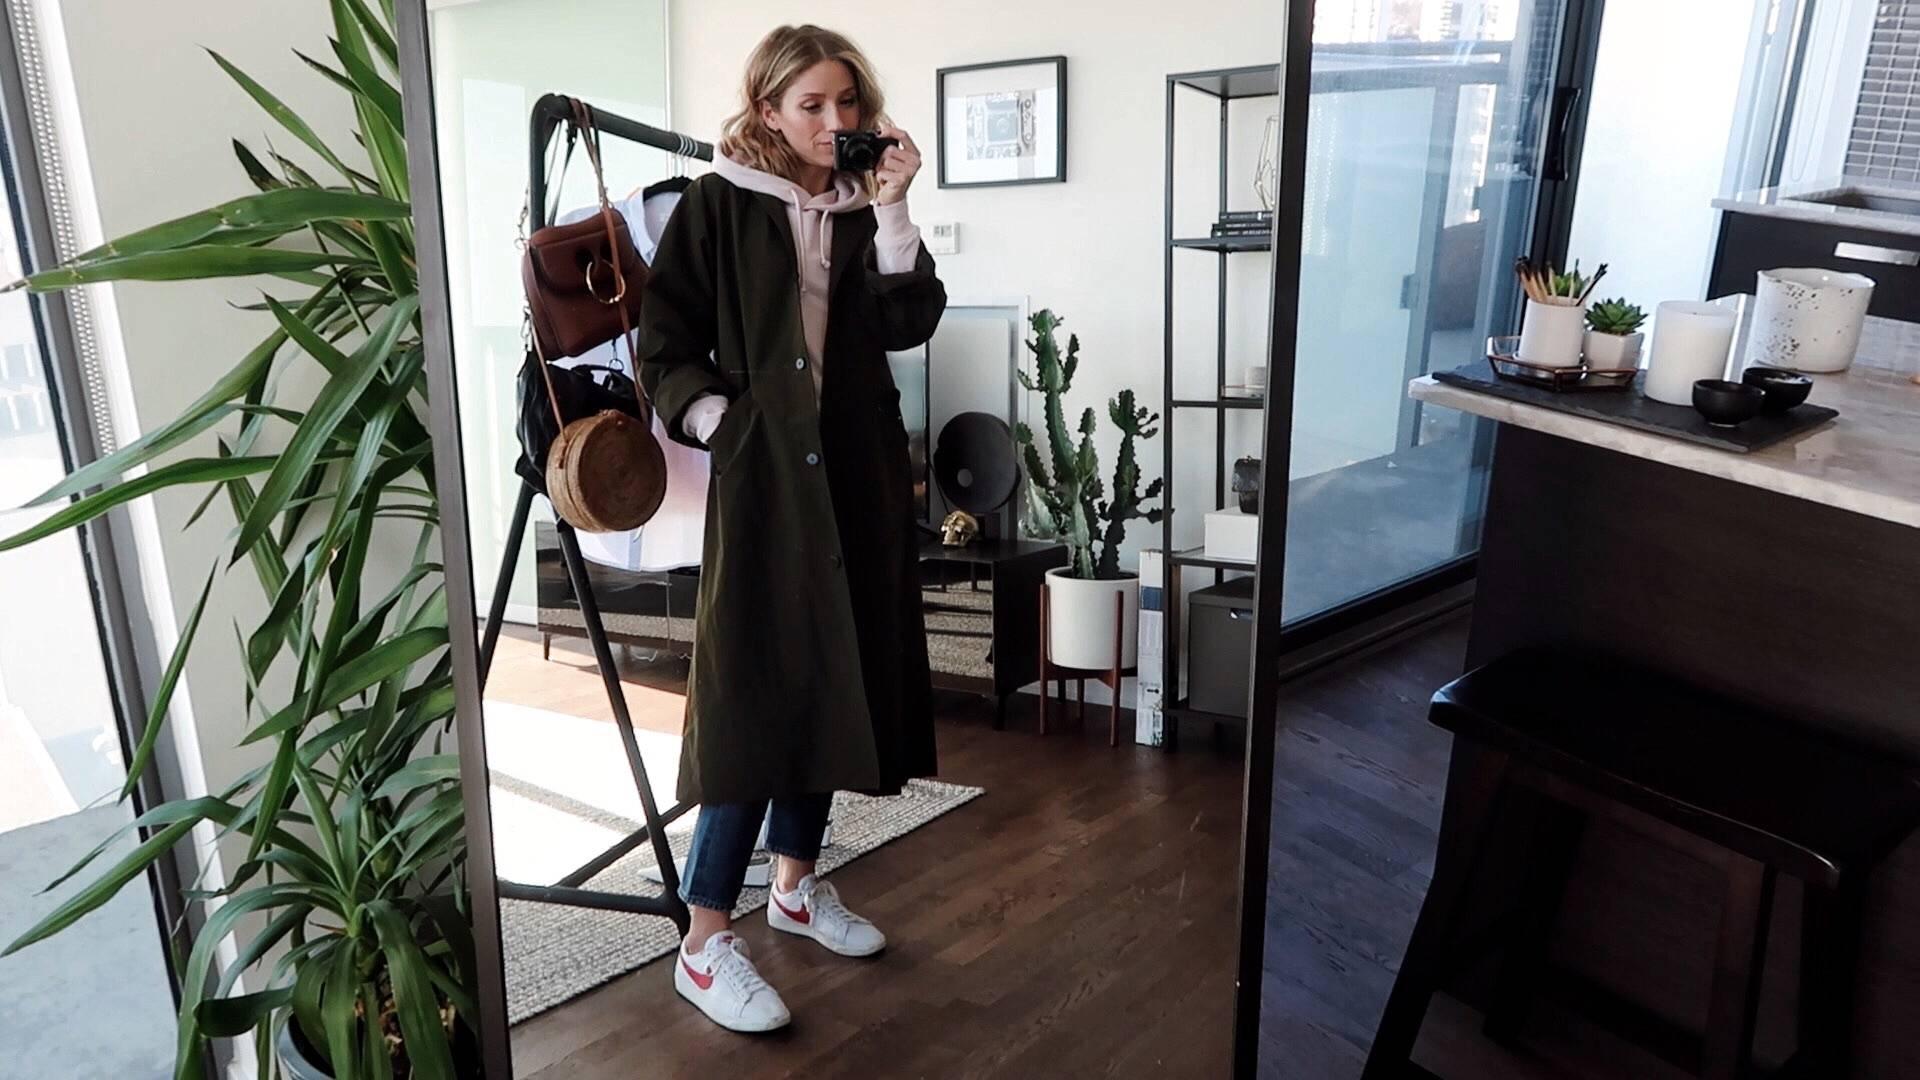 c92d052d5 ARITZIA SPRING CLOTHING HAUL | The August Diaries